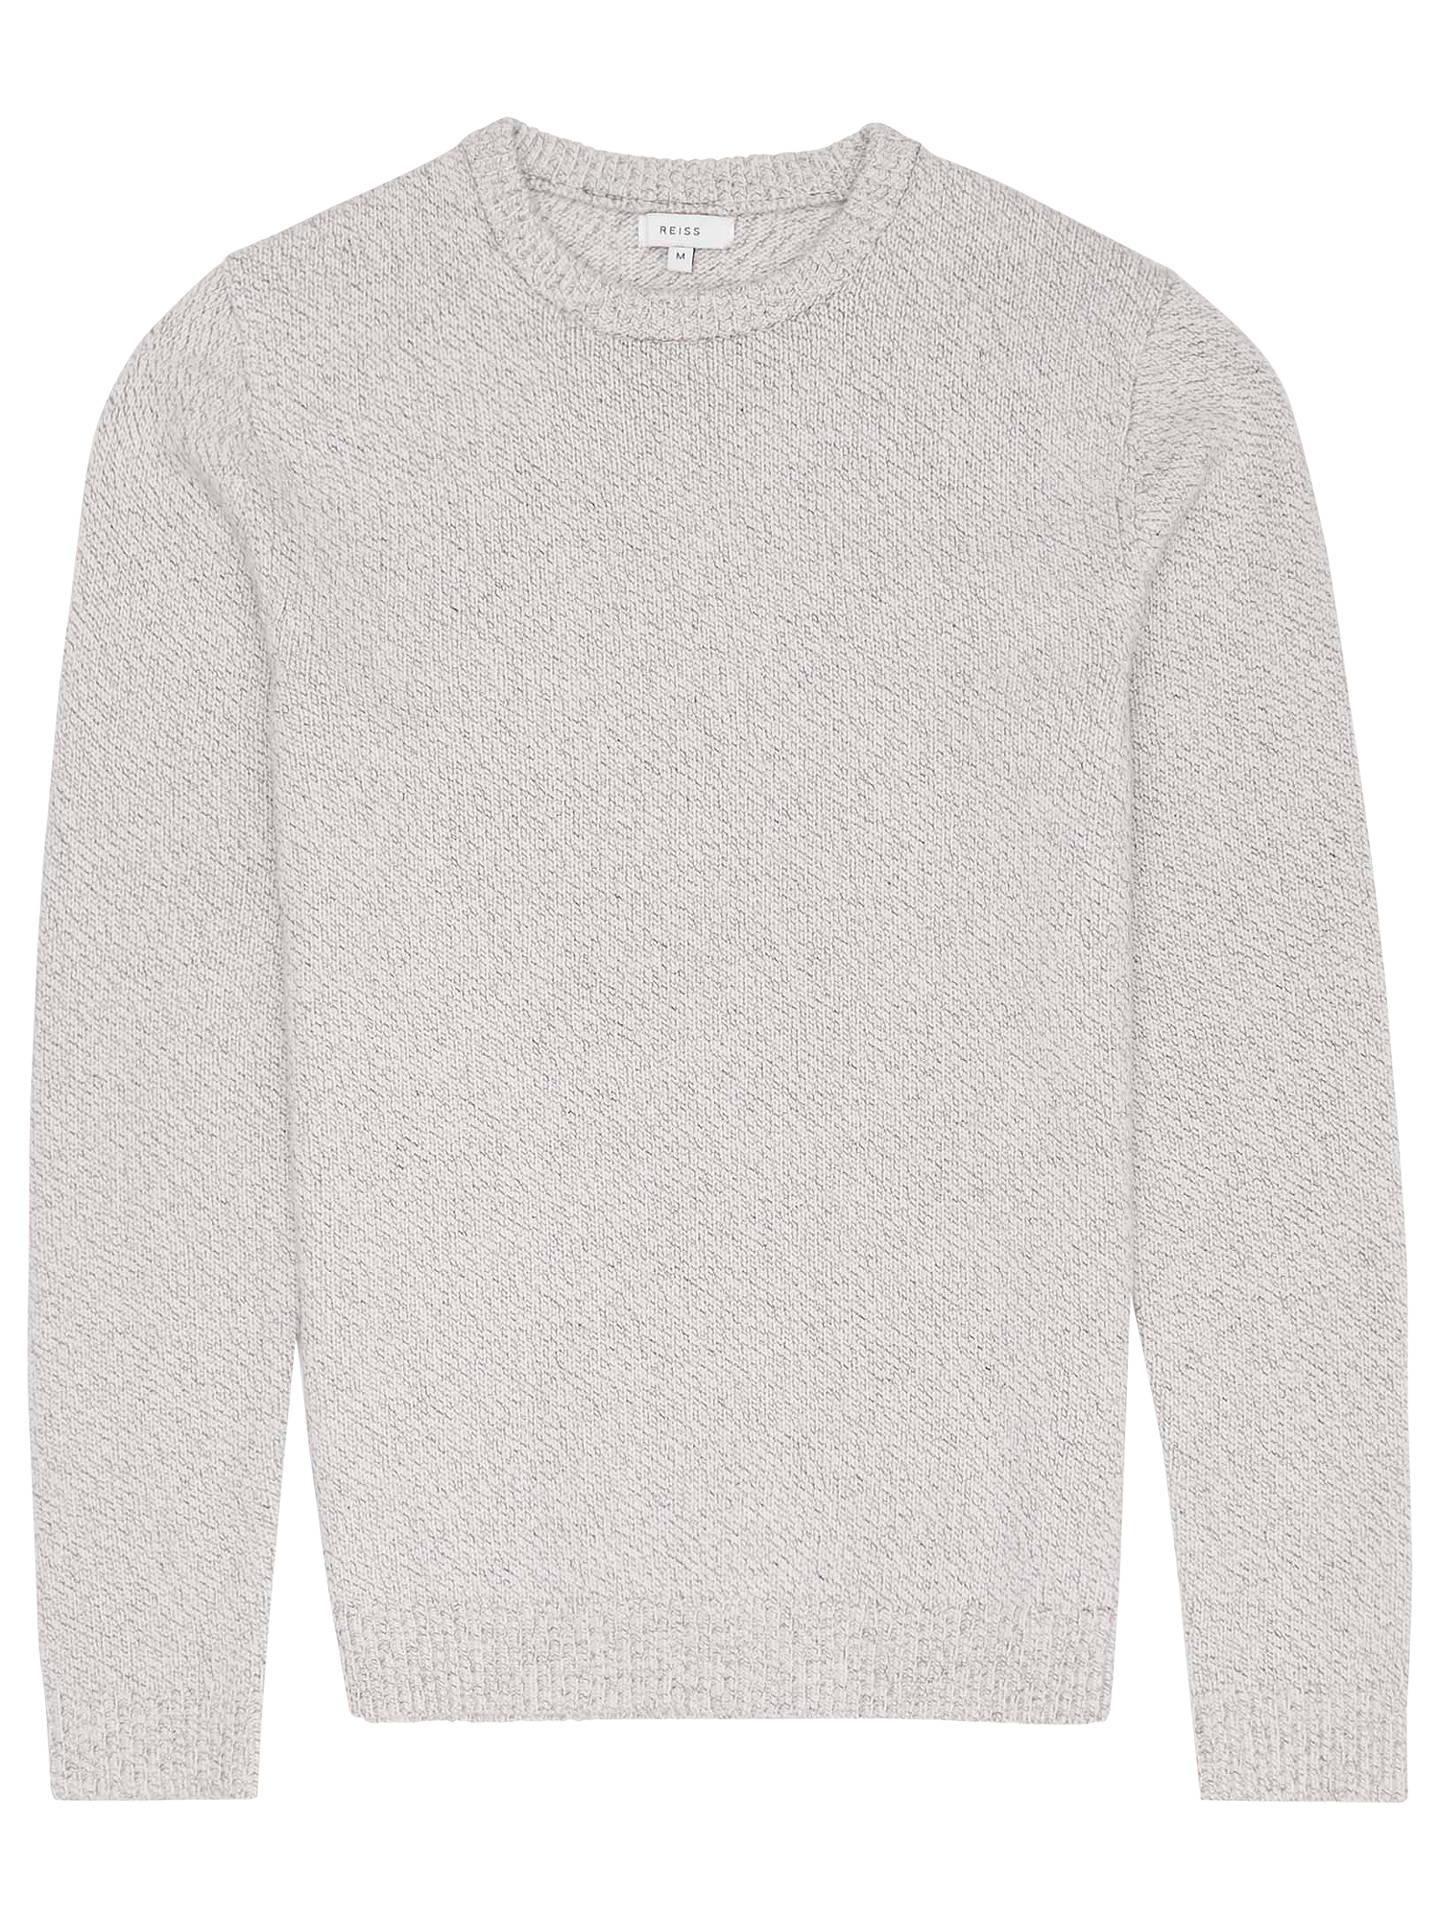 Reiss Andrew Flecked Crew Neck Jumper At John Lewis Partners Smith Floral Printed Shirt Navy Xxl Buyreiss Soft Grey Xs Online